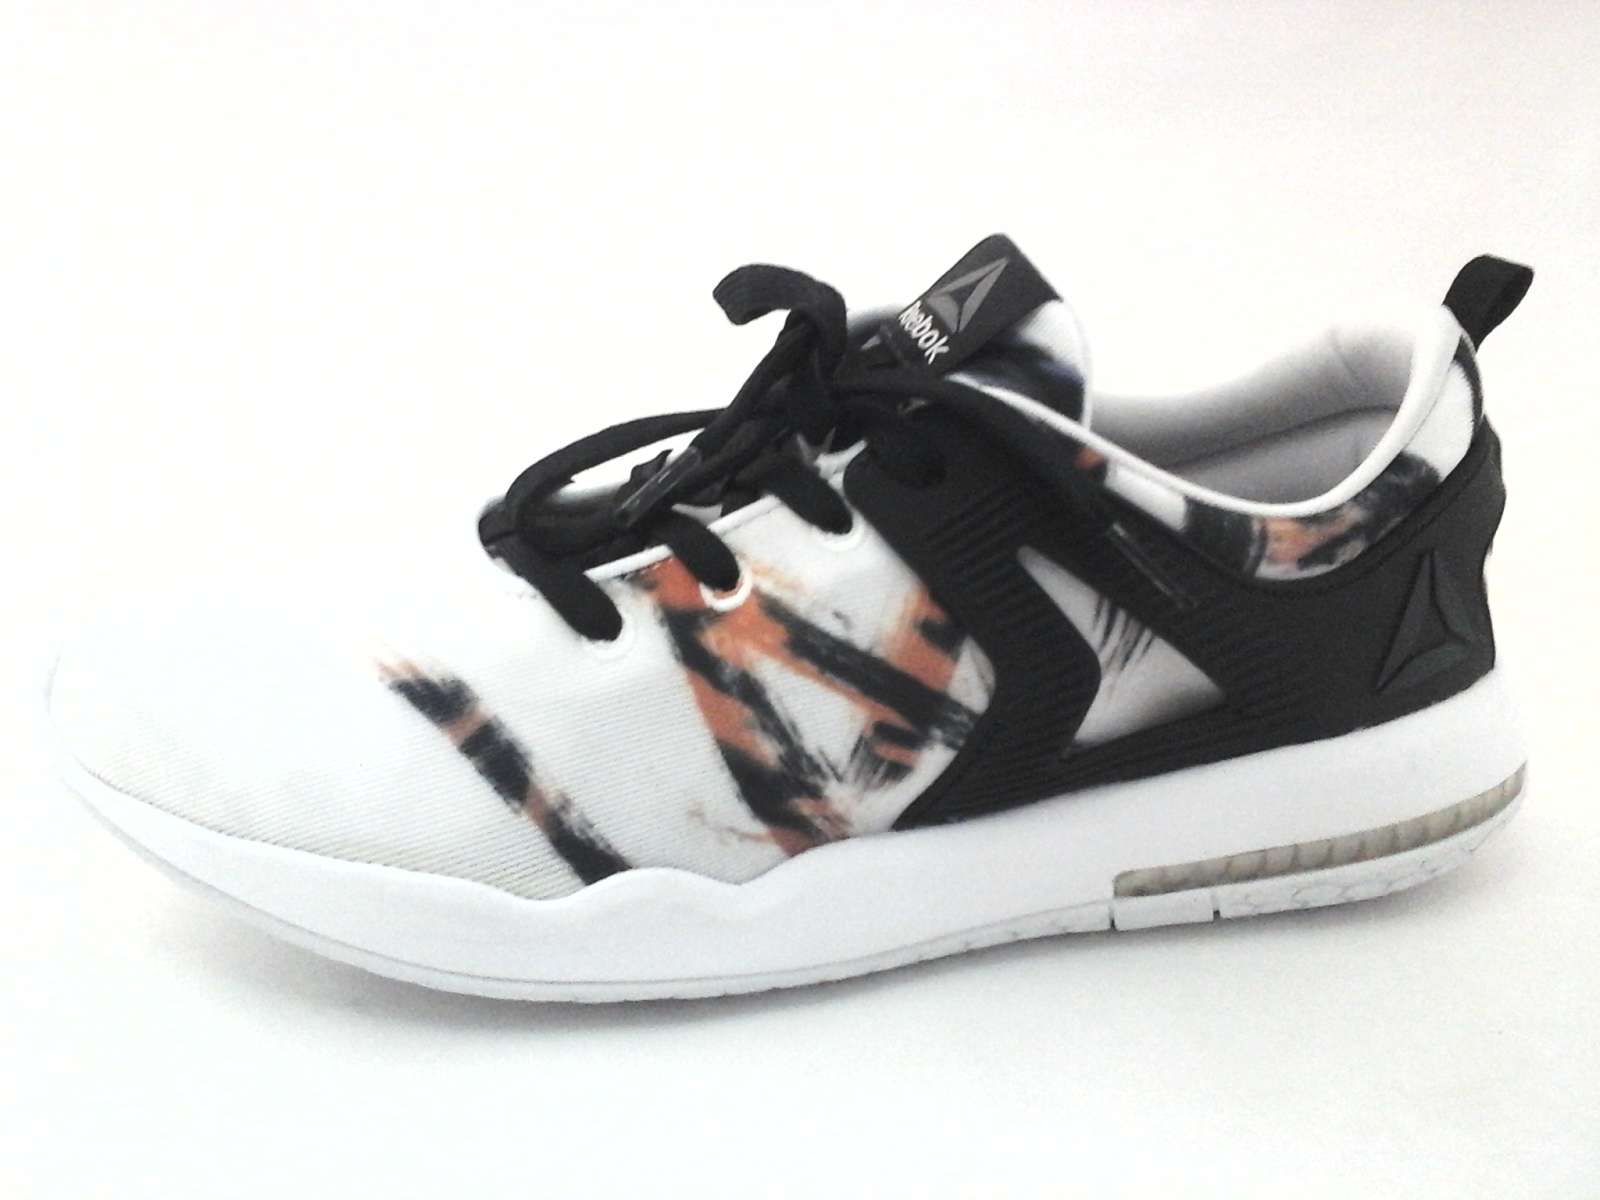 Reebok Women s Hexalite X Glide Running Shoe Black White Coal US 9.5 EU  40.5 New 8f05a7939